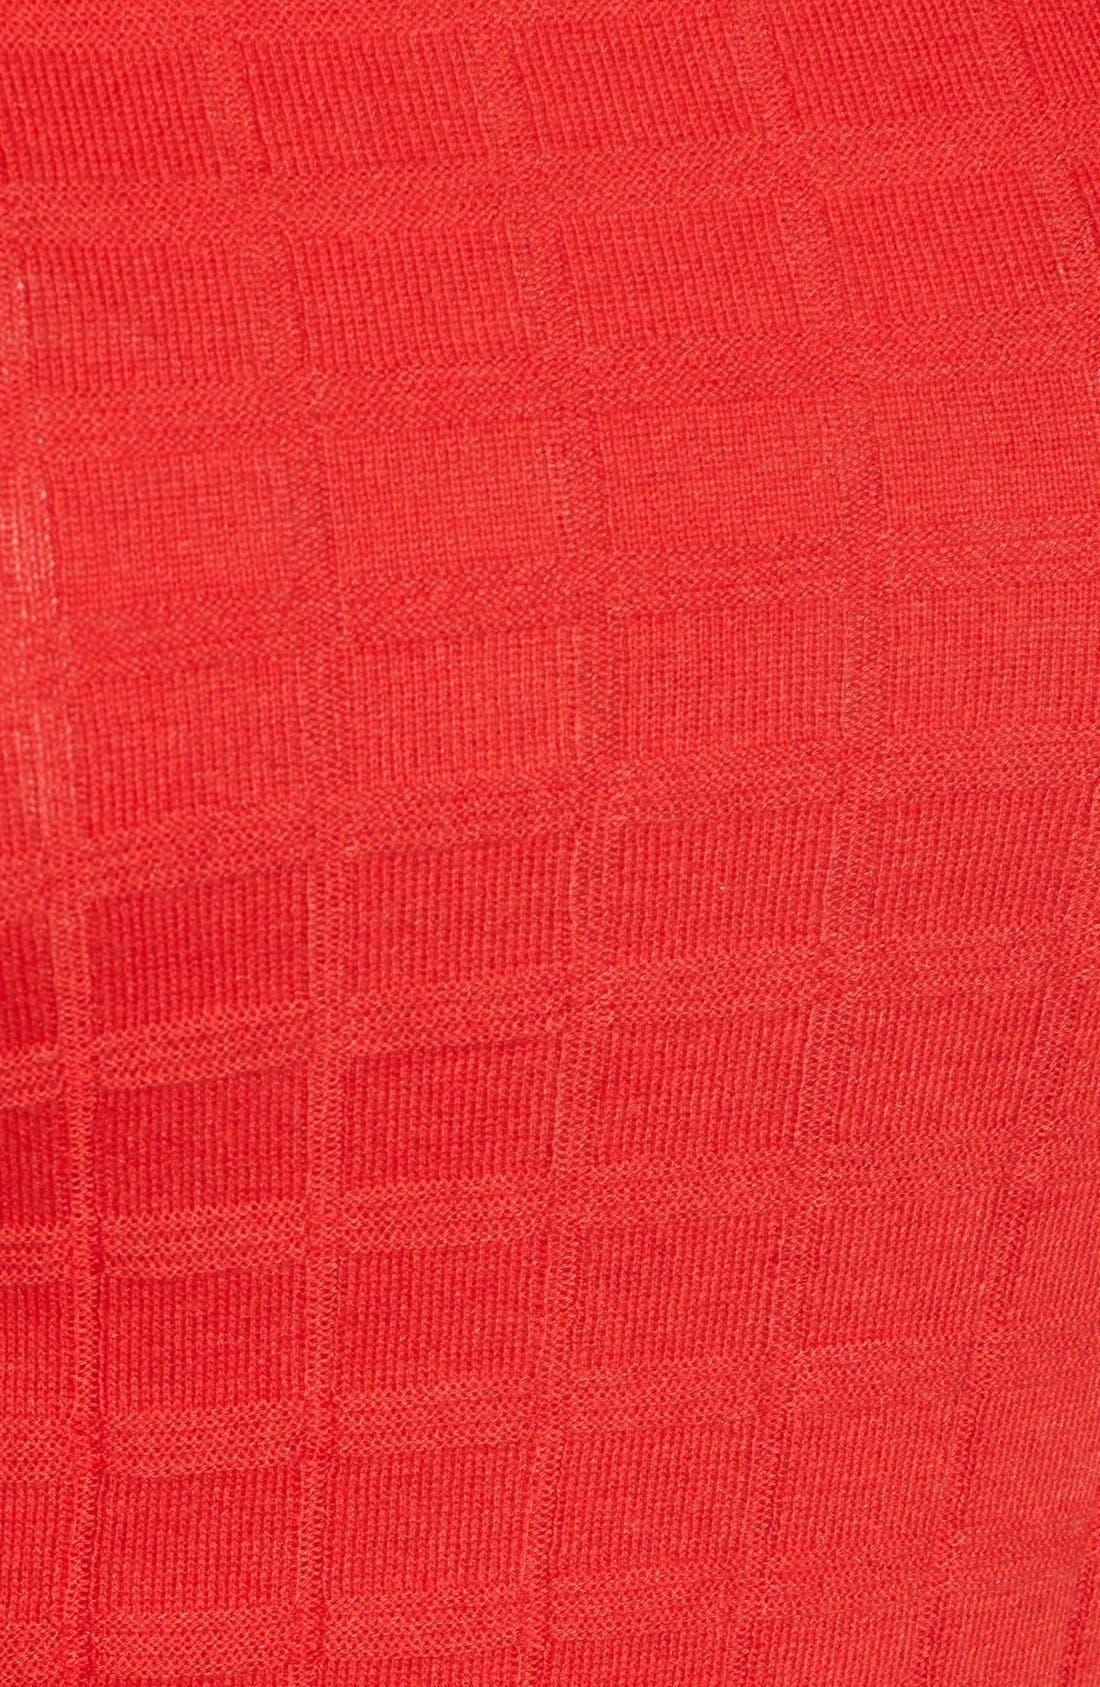 Cotton Blend Pullover,                             Alternate thumbnail 111, color,